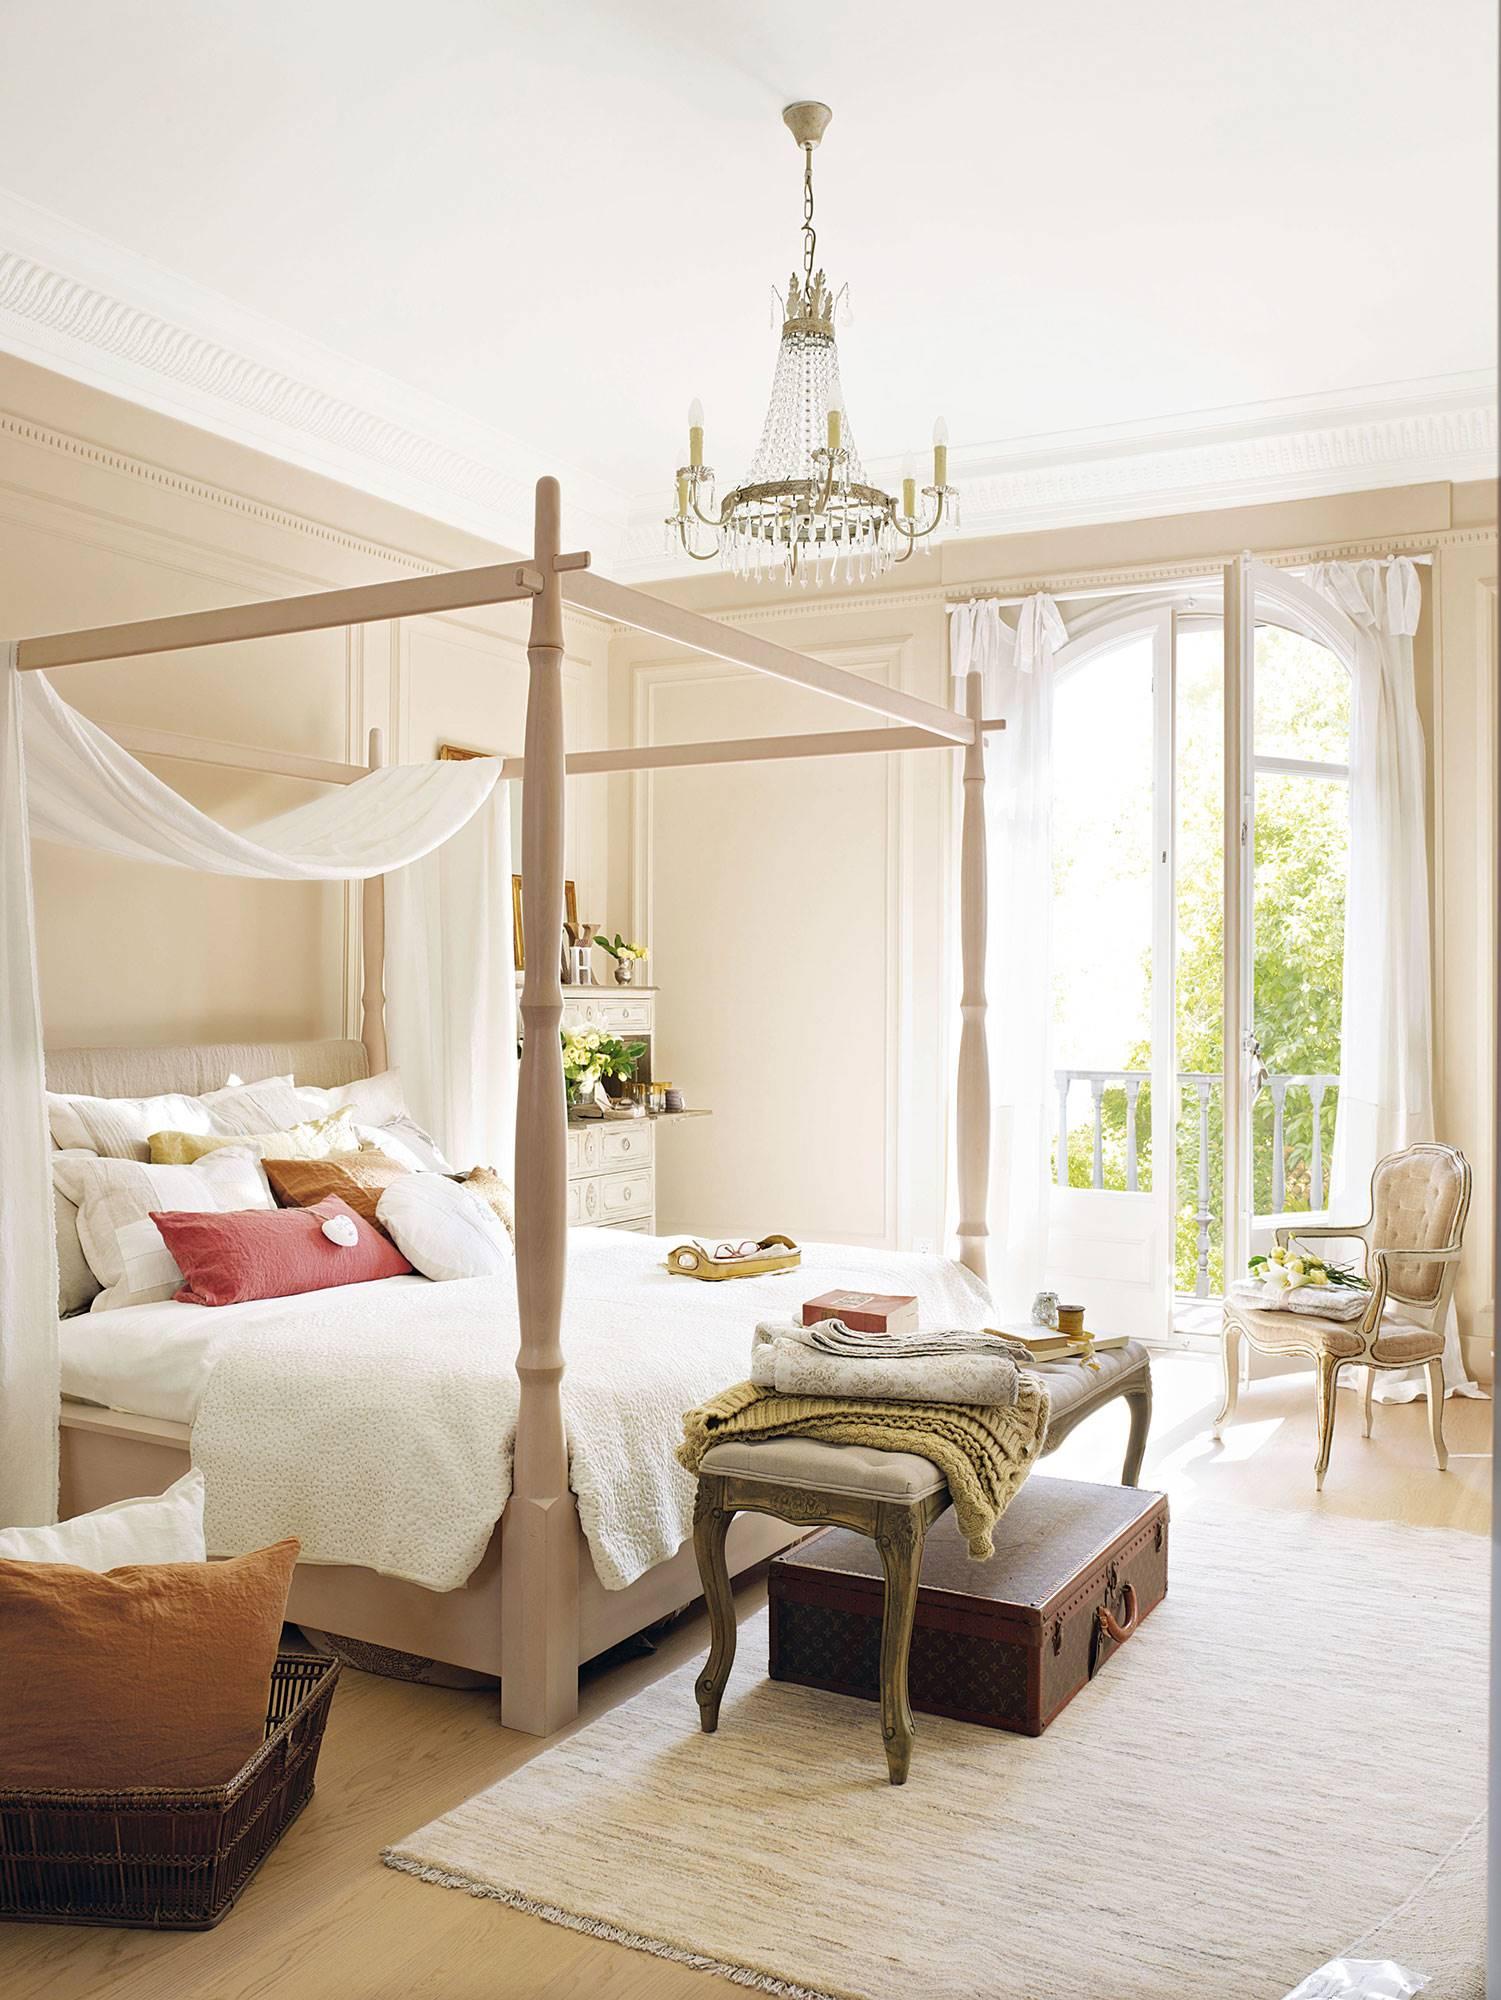 dormitorio-con-cama-con-dosel 11a48bb1. Elegantemente romántico